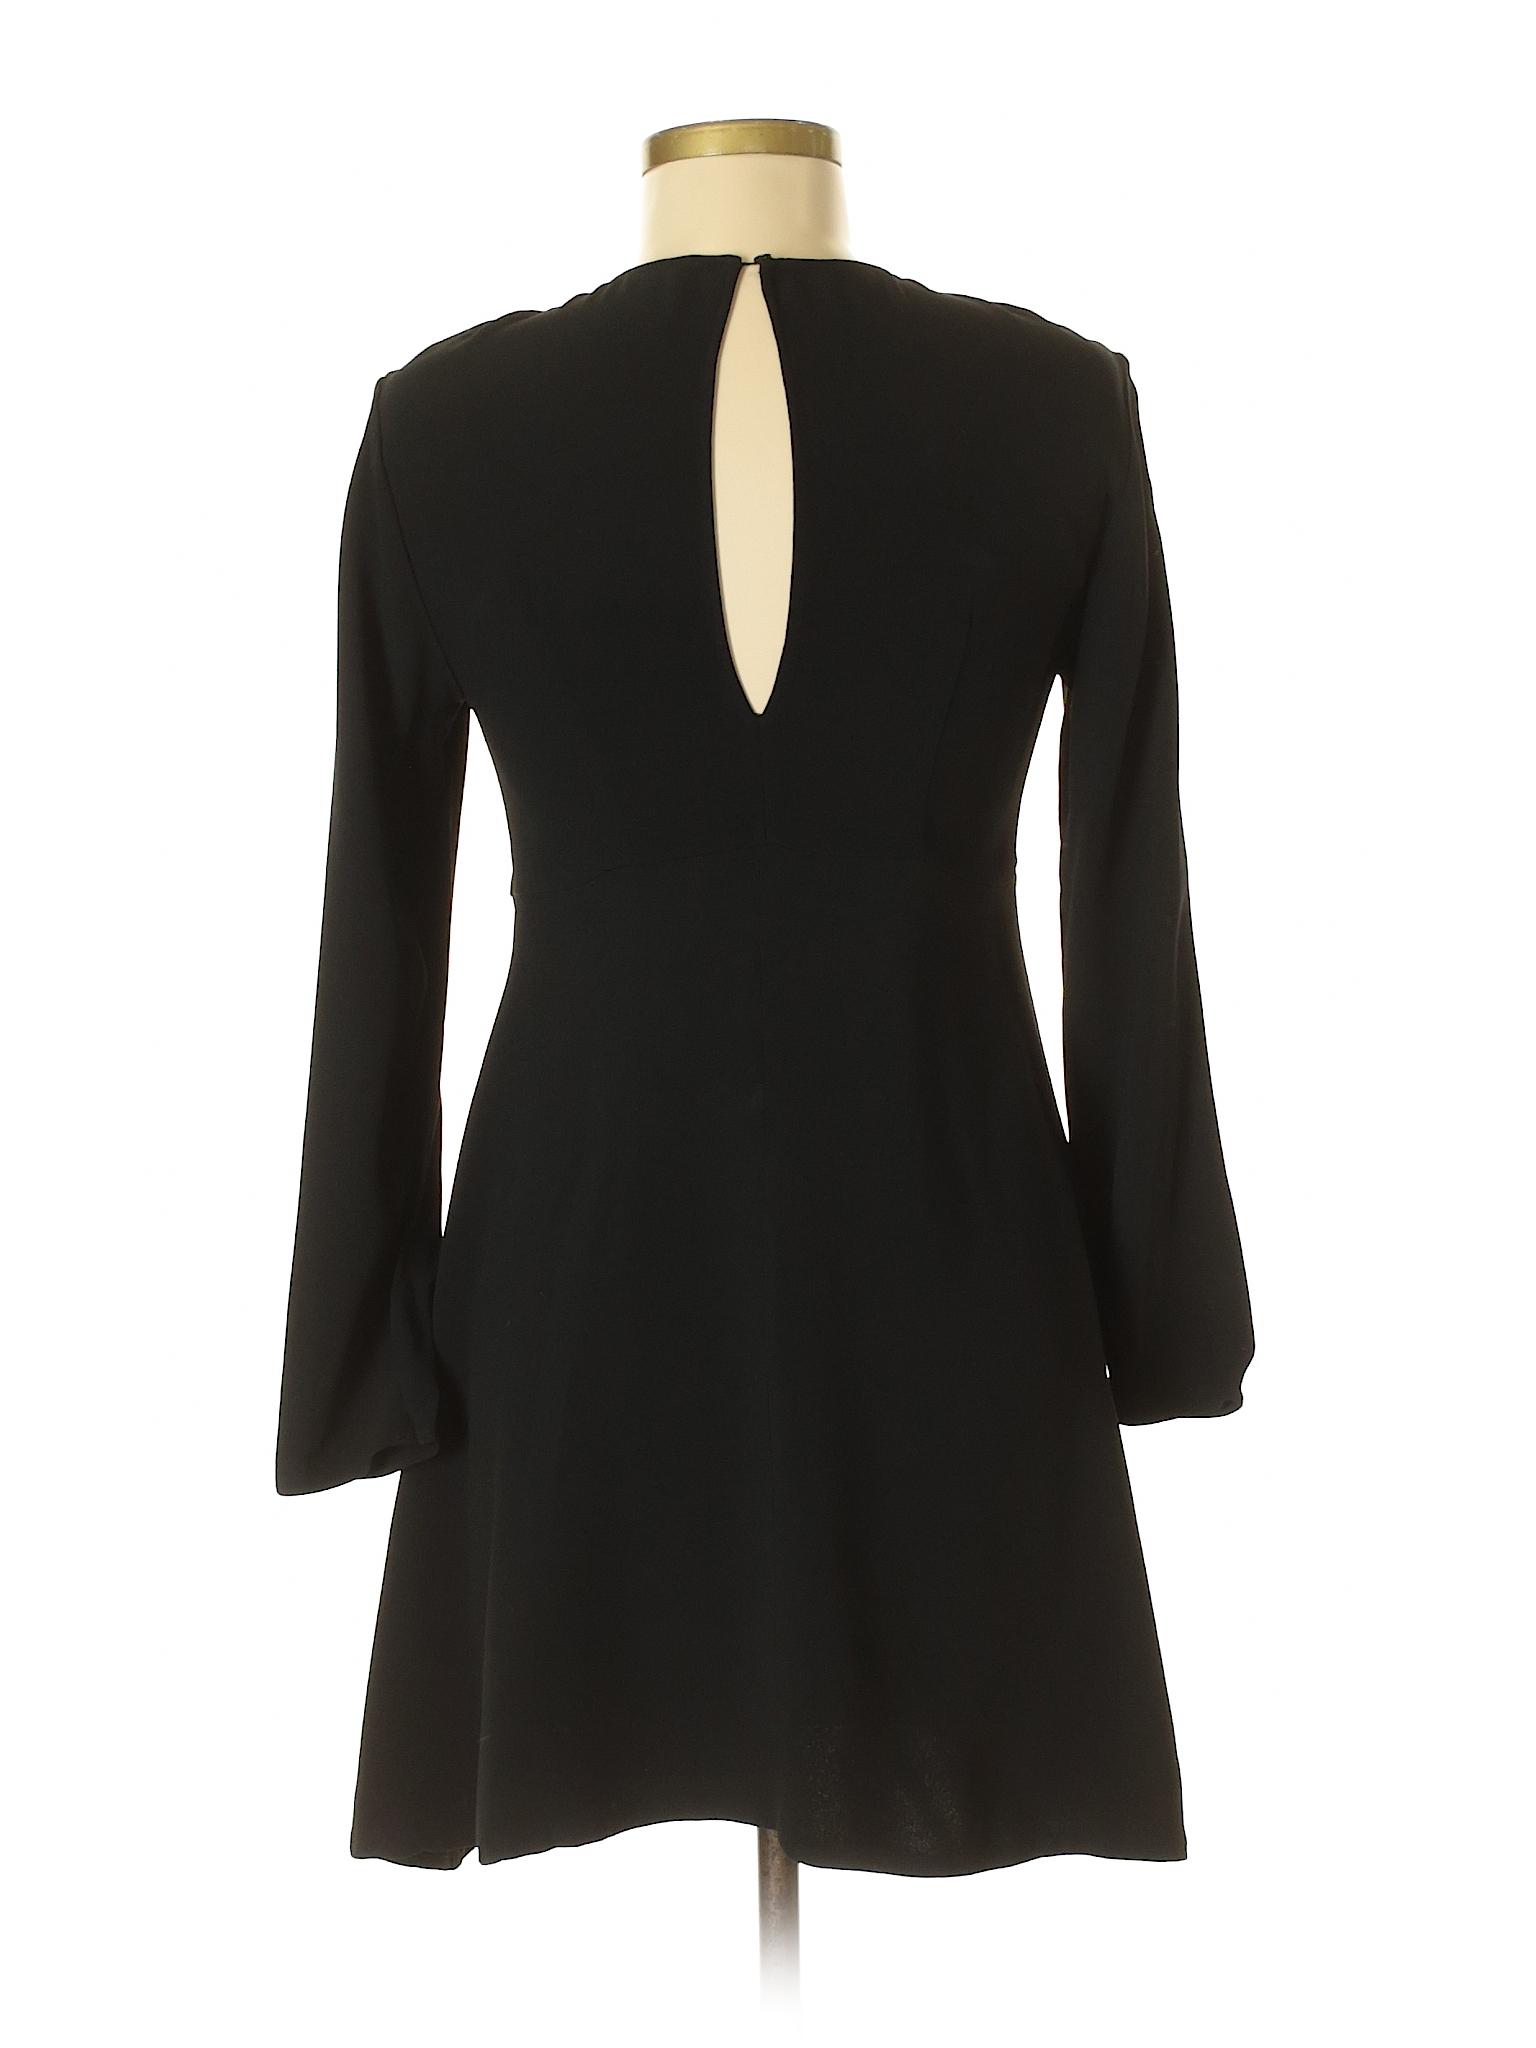 Zara Selling Casual Dress Zara Casual Dress Zara Selling Selling Casual Selling Dress Zara qrwBxAqtnZ